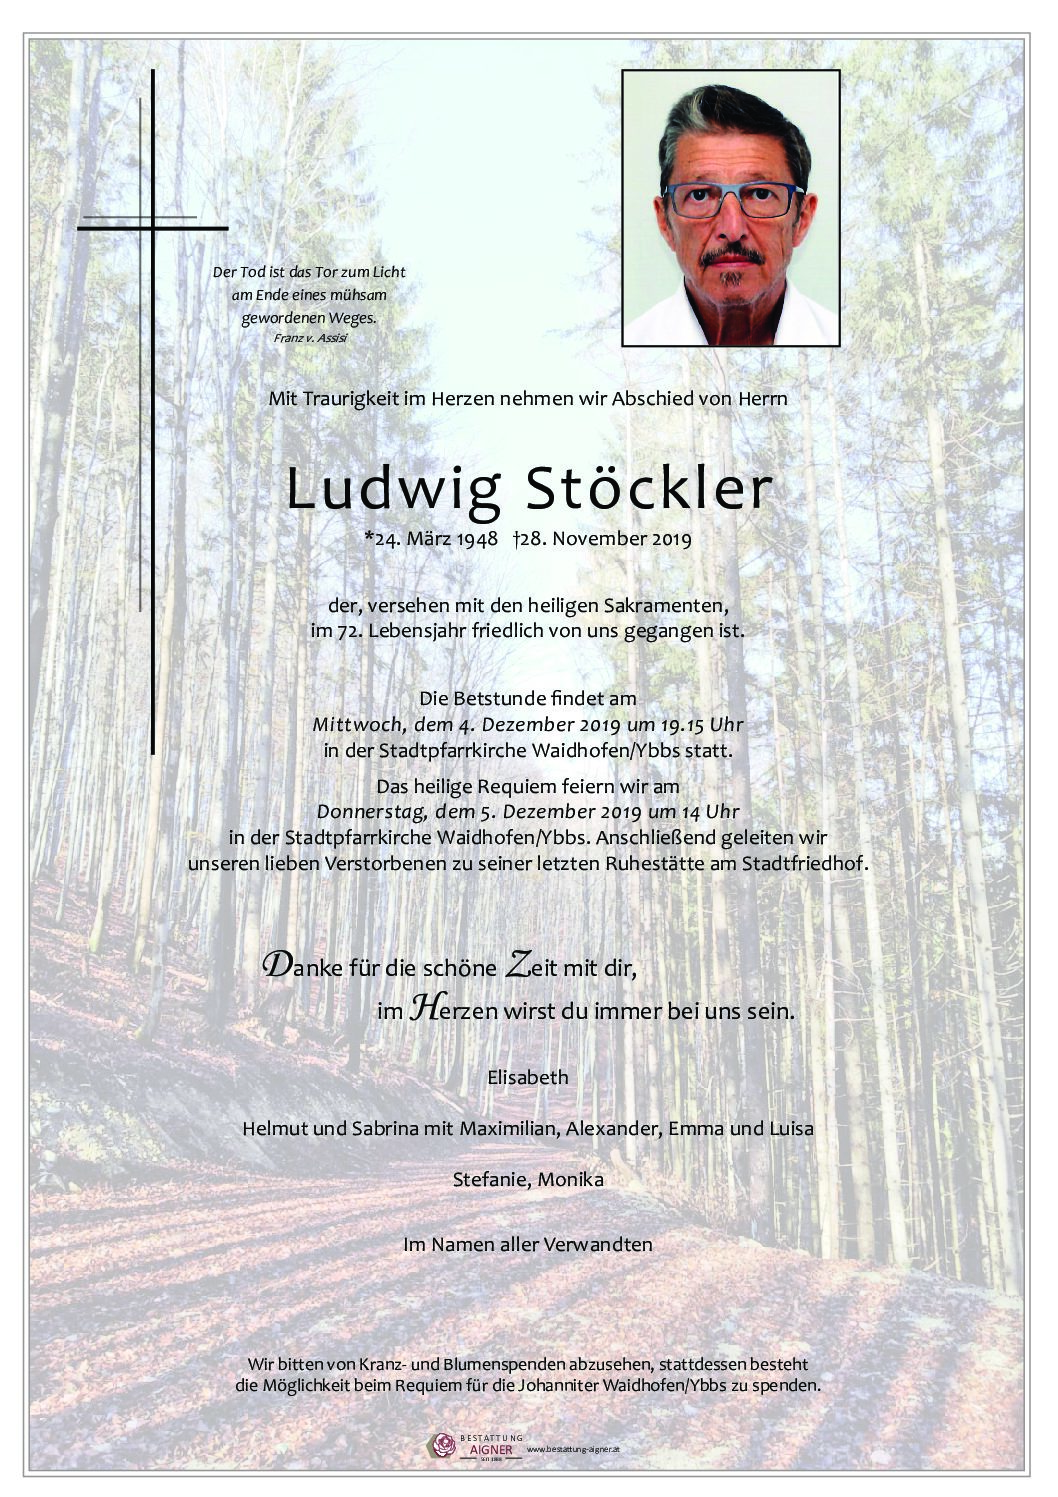 Ludwig Stöckler